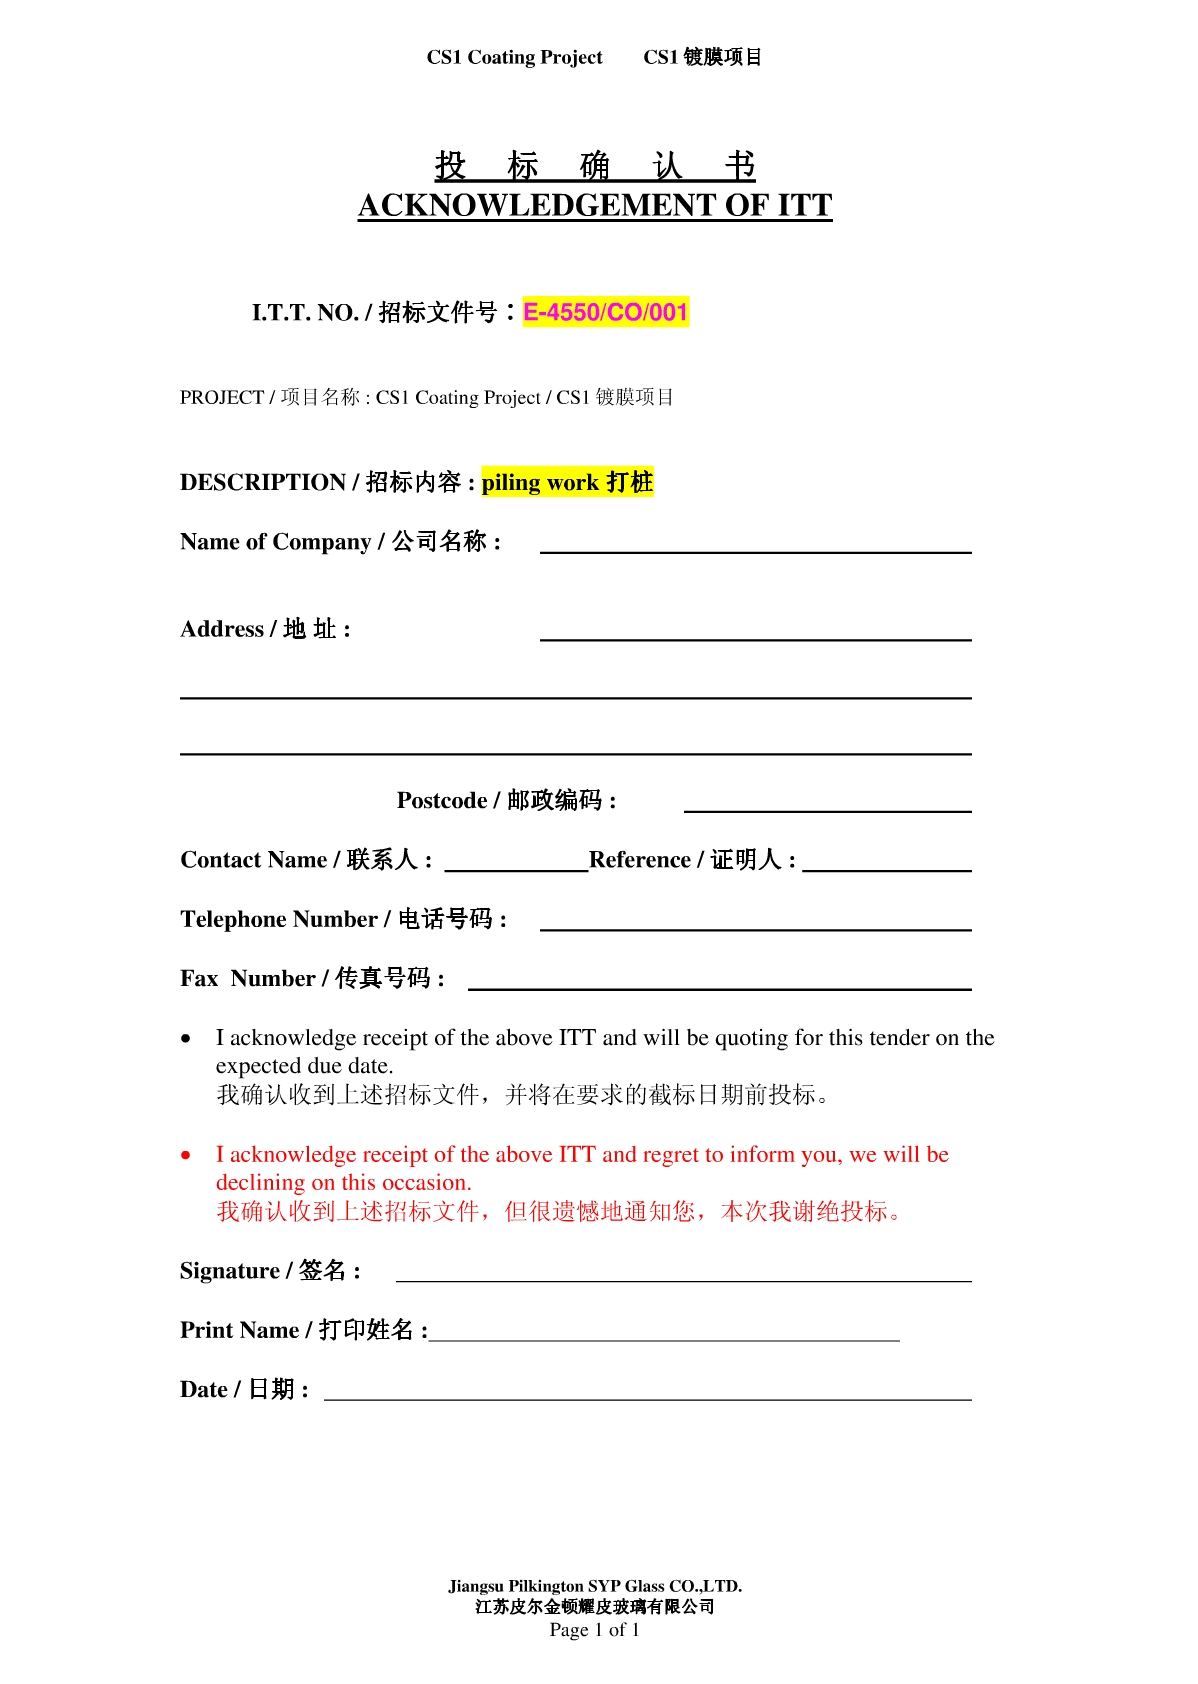 db文件_中文英文对照完整的大型工程招标文件及投标书实例(全套)-5821db1aff